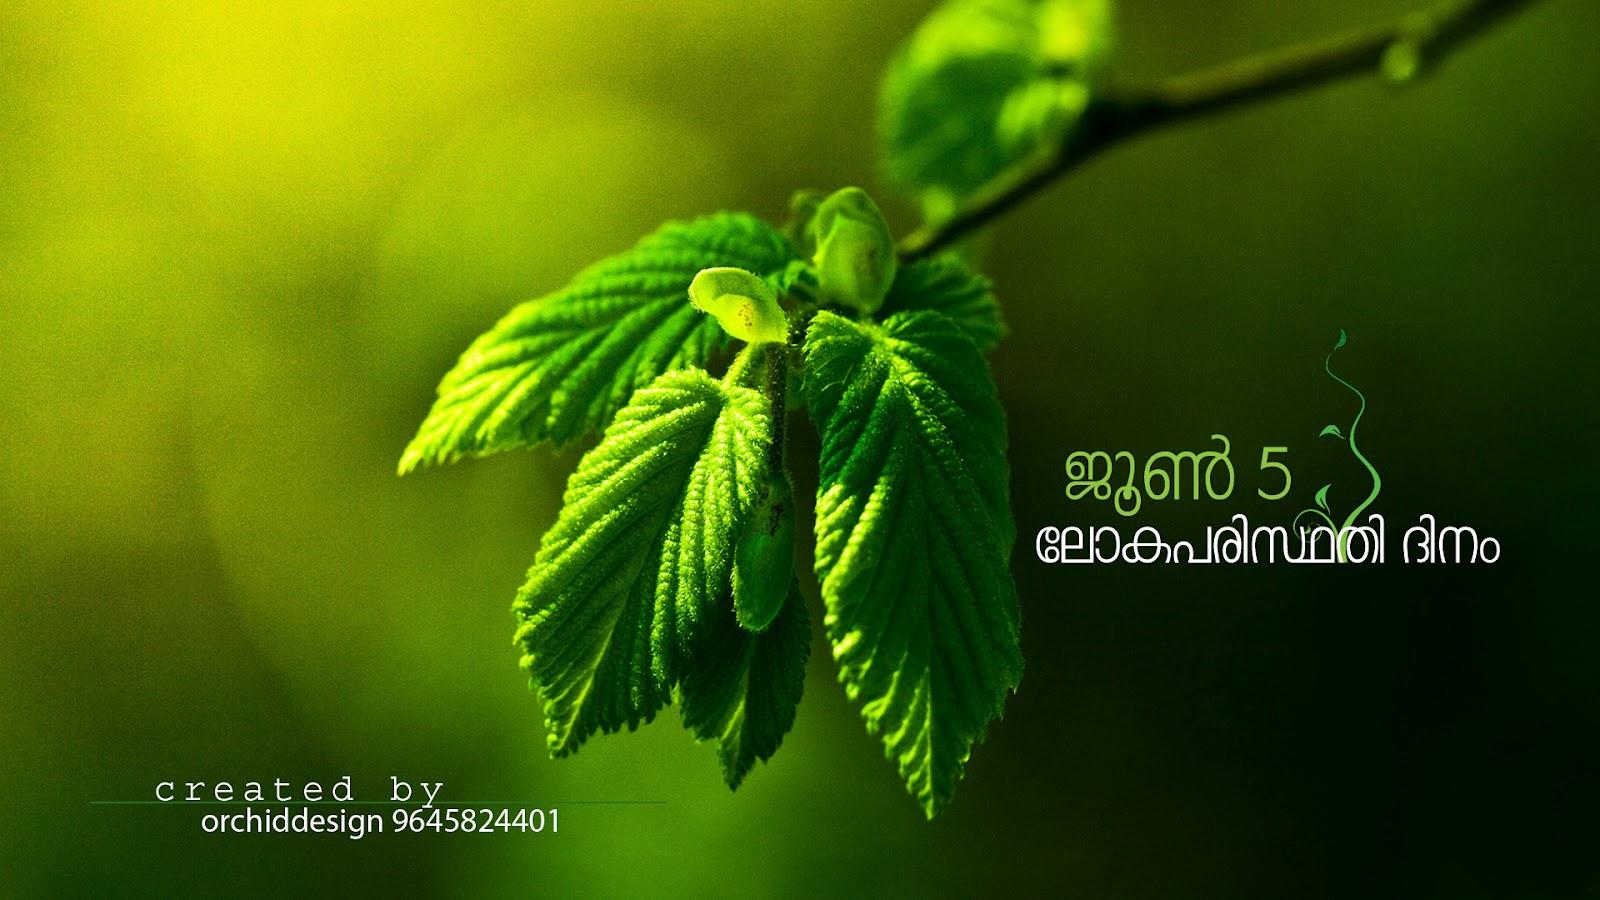 Subrandesign Save Nature